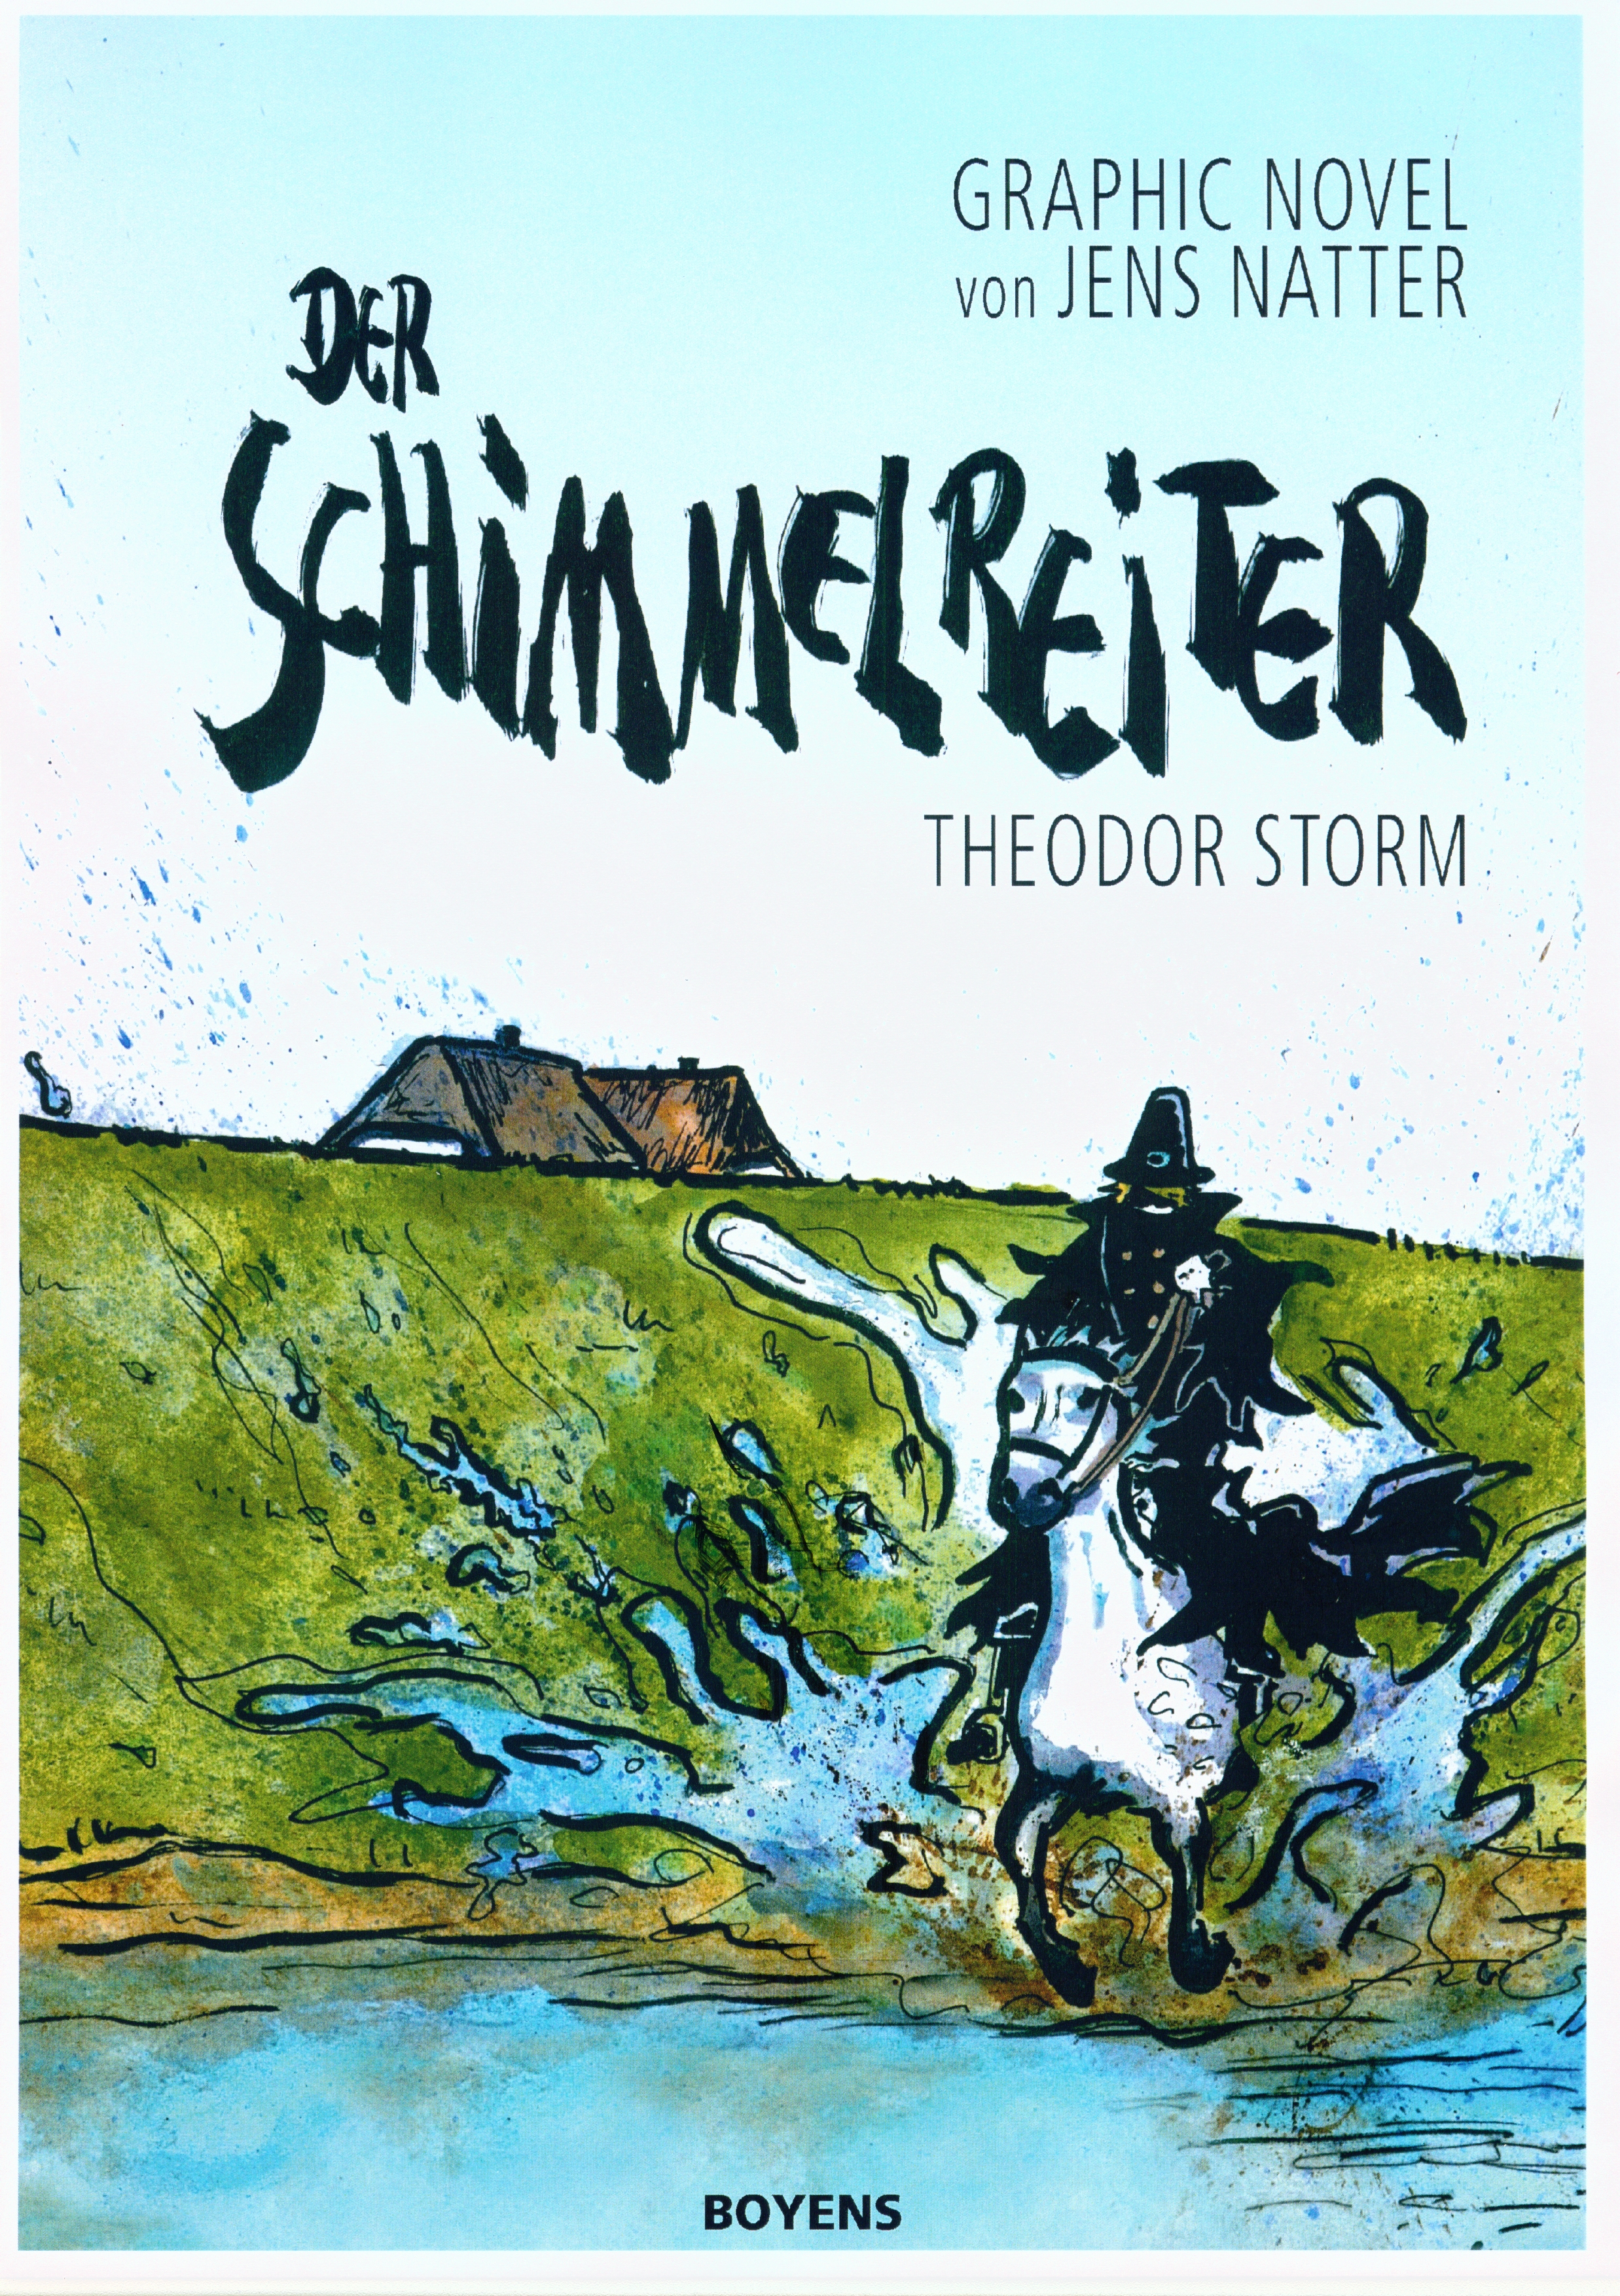 Der Schimmelreiter – Graphic Novel (Theodor Storm - Jens Natter)